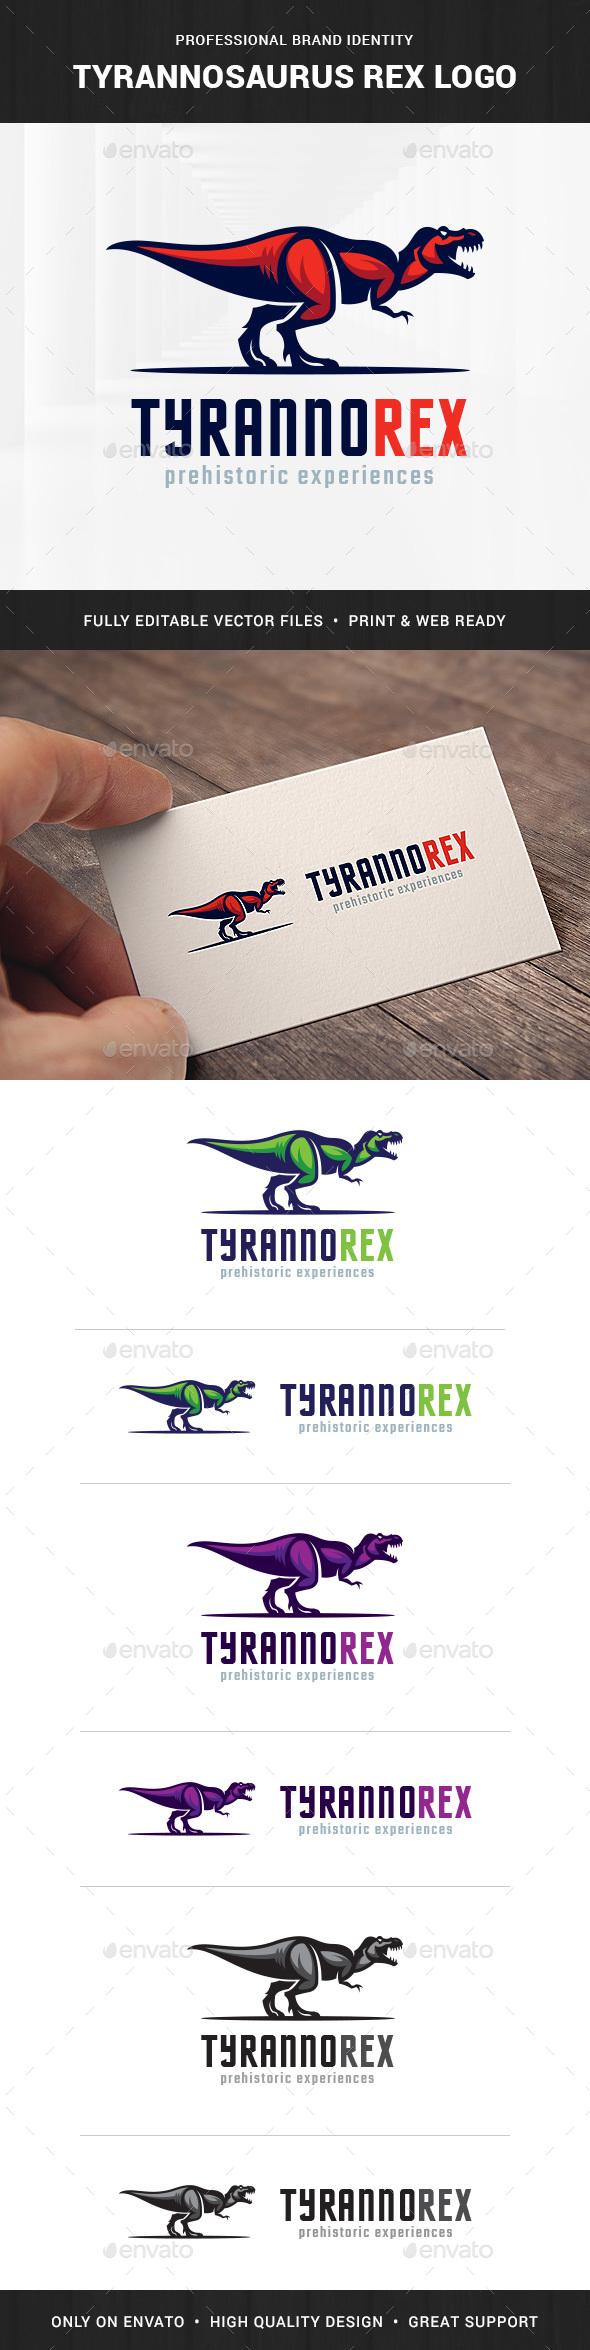 Tyrannosaurus Rex Logo Template